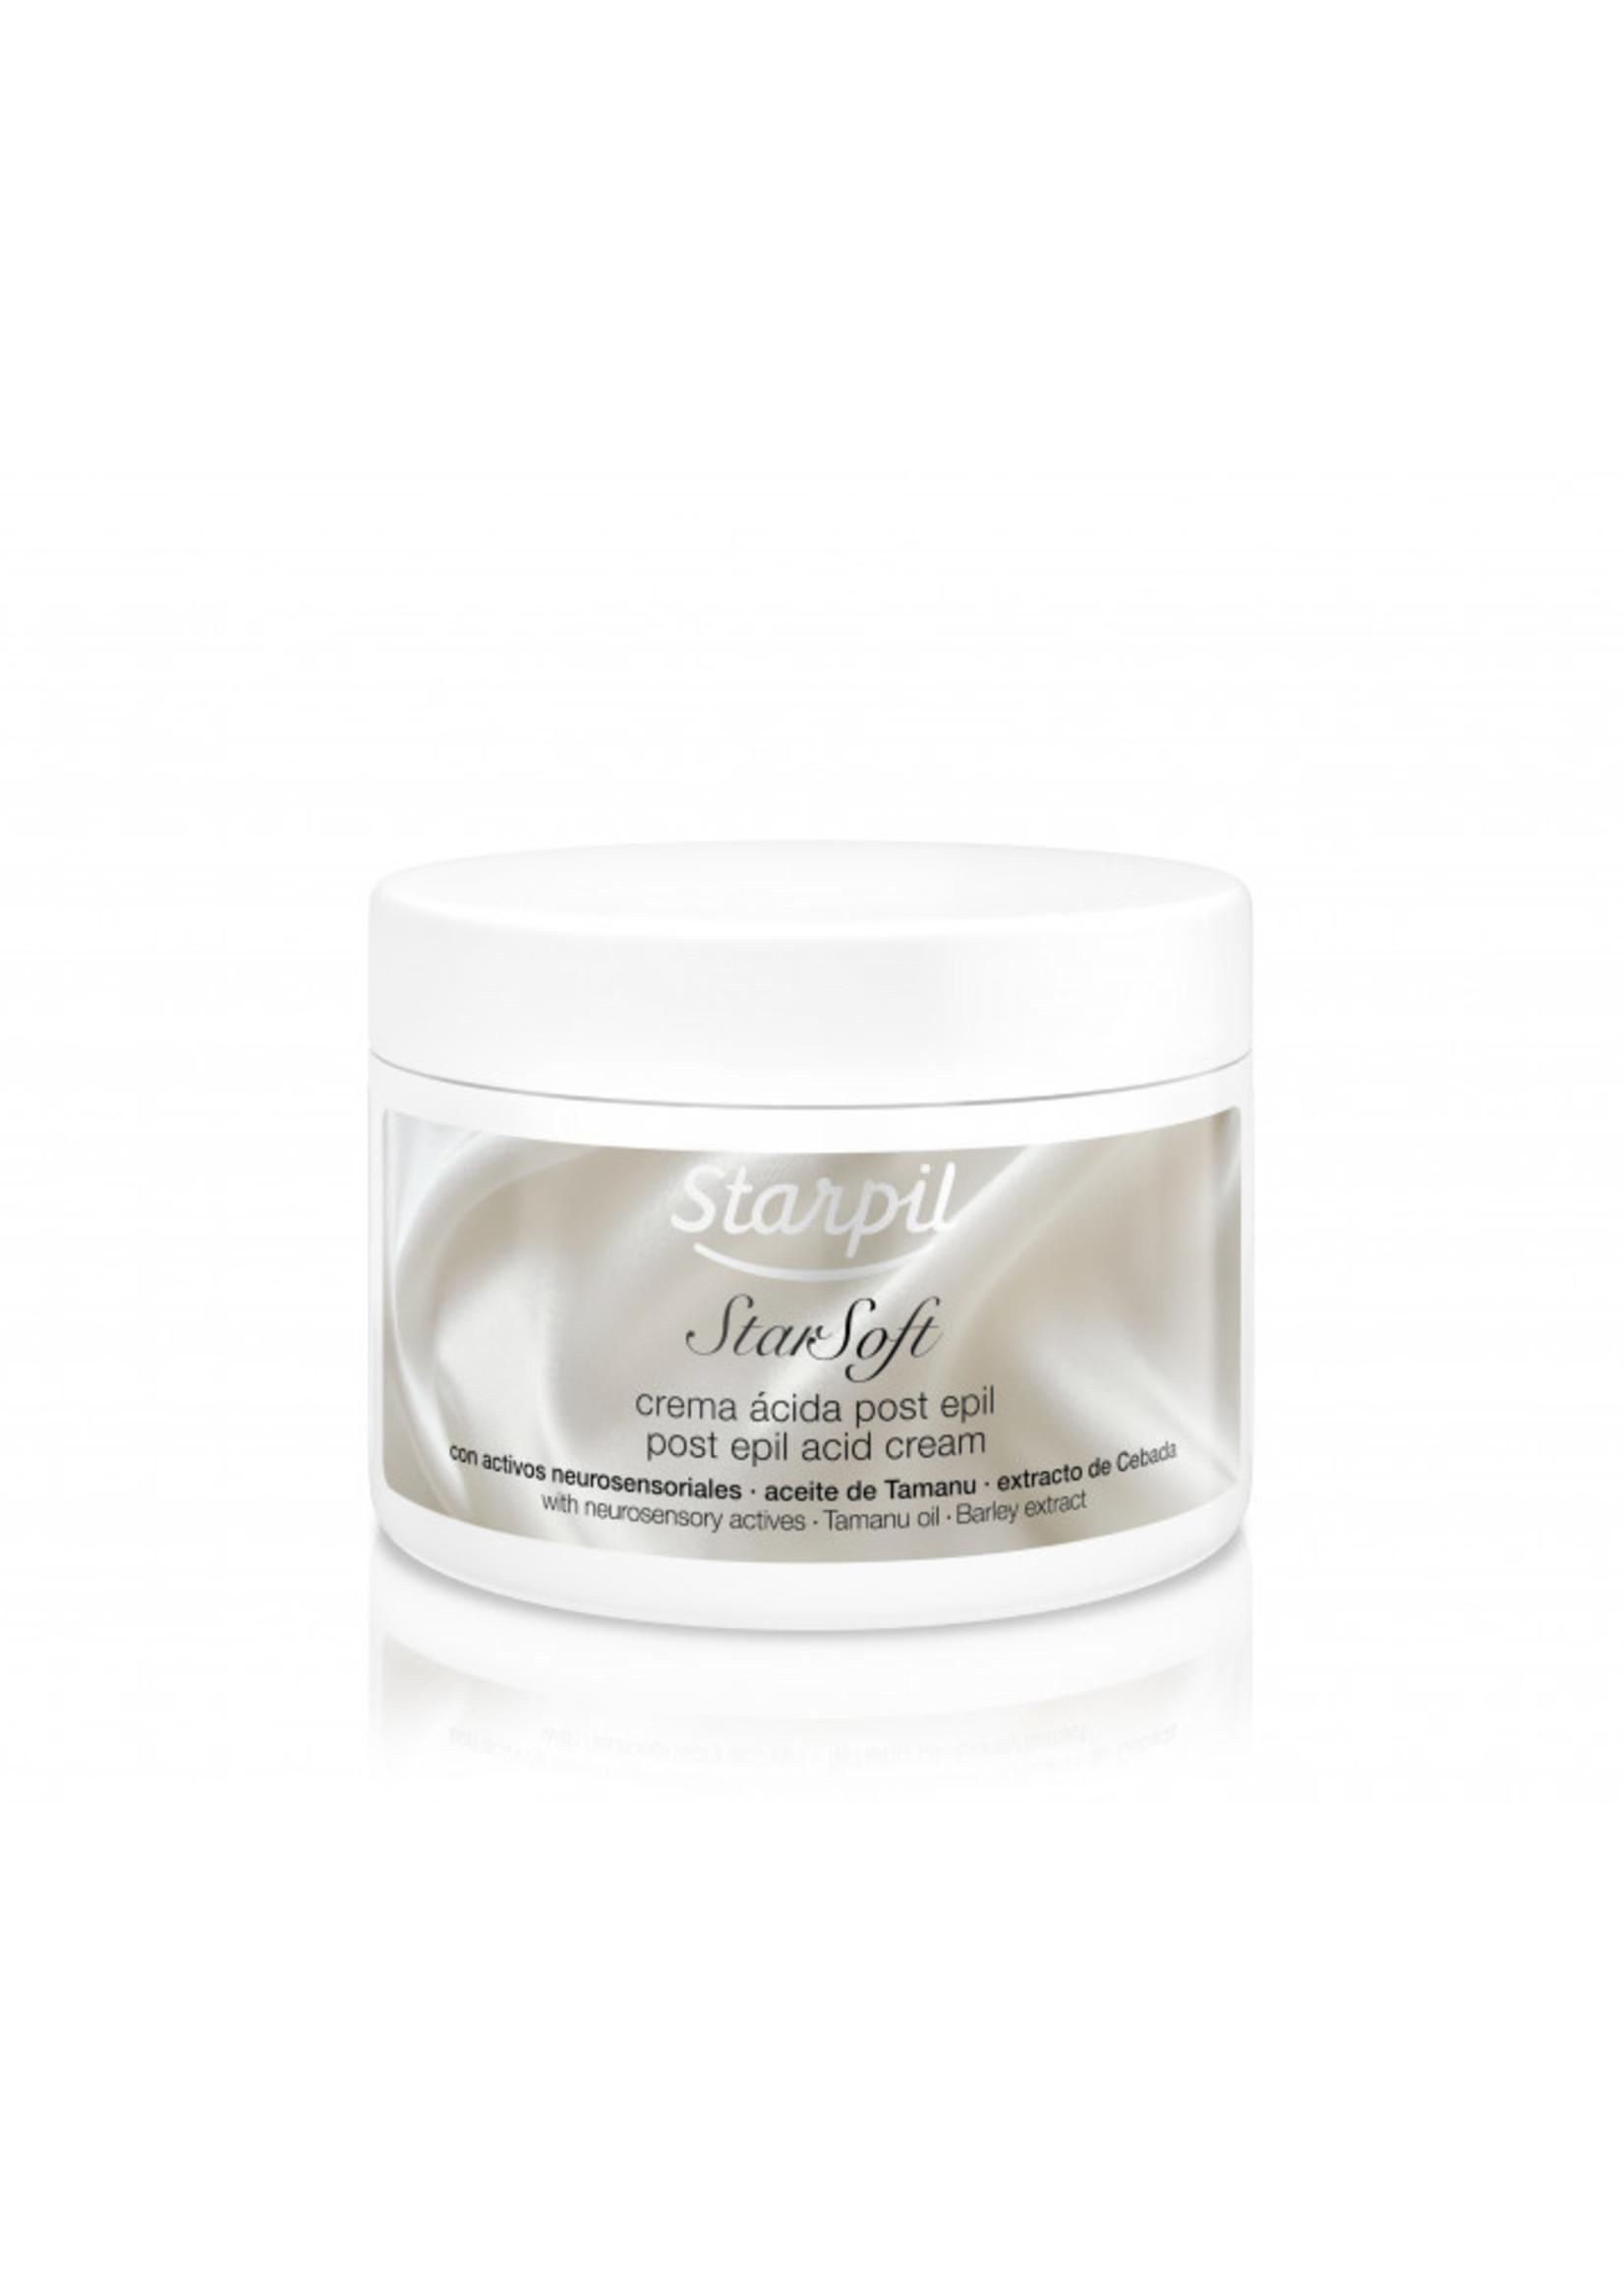 Starpil Starsoft Acid Cream 200 ML